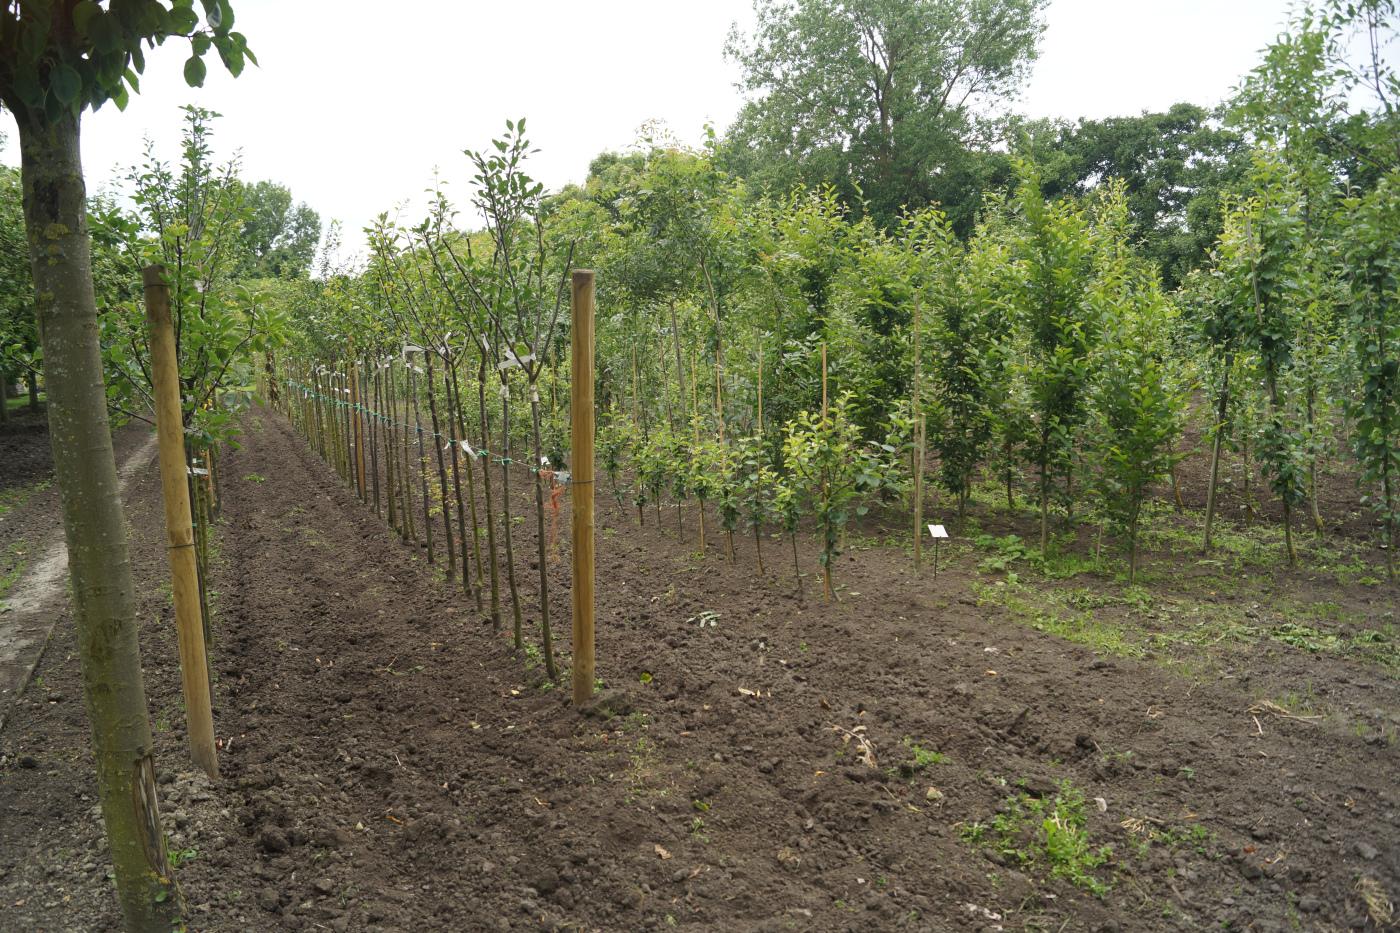 fruitbomen-opkweek-fruitboomkwekerij-Blankenberge-Jan Sterken